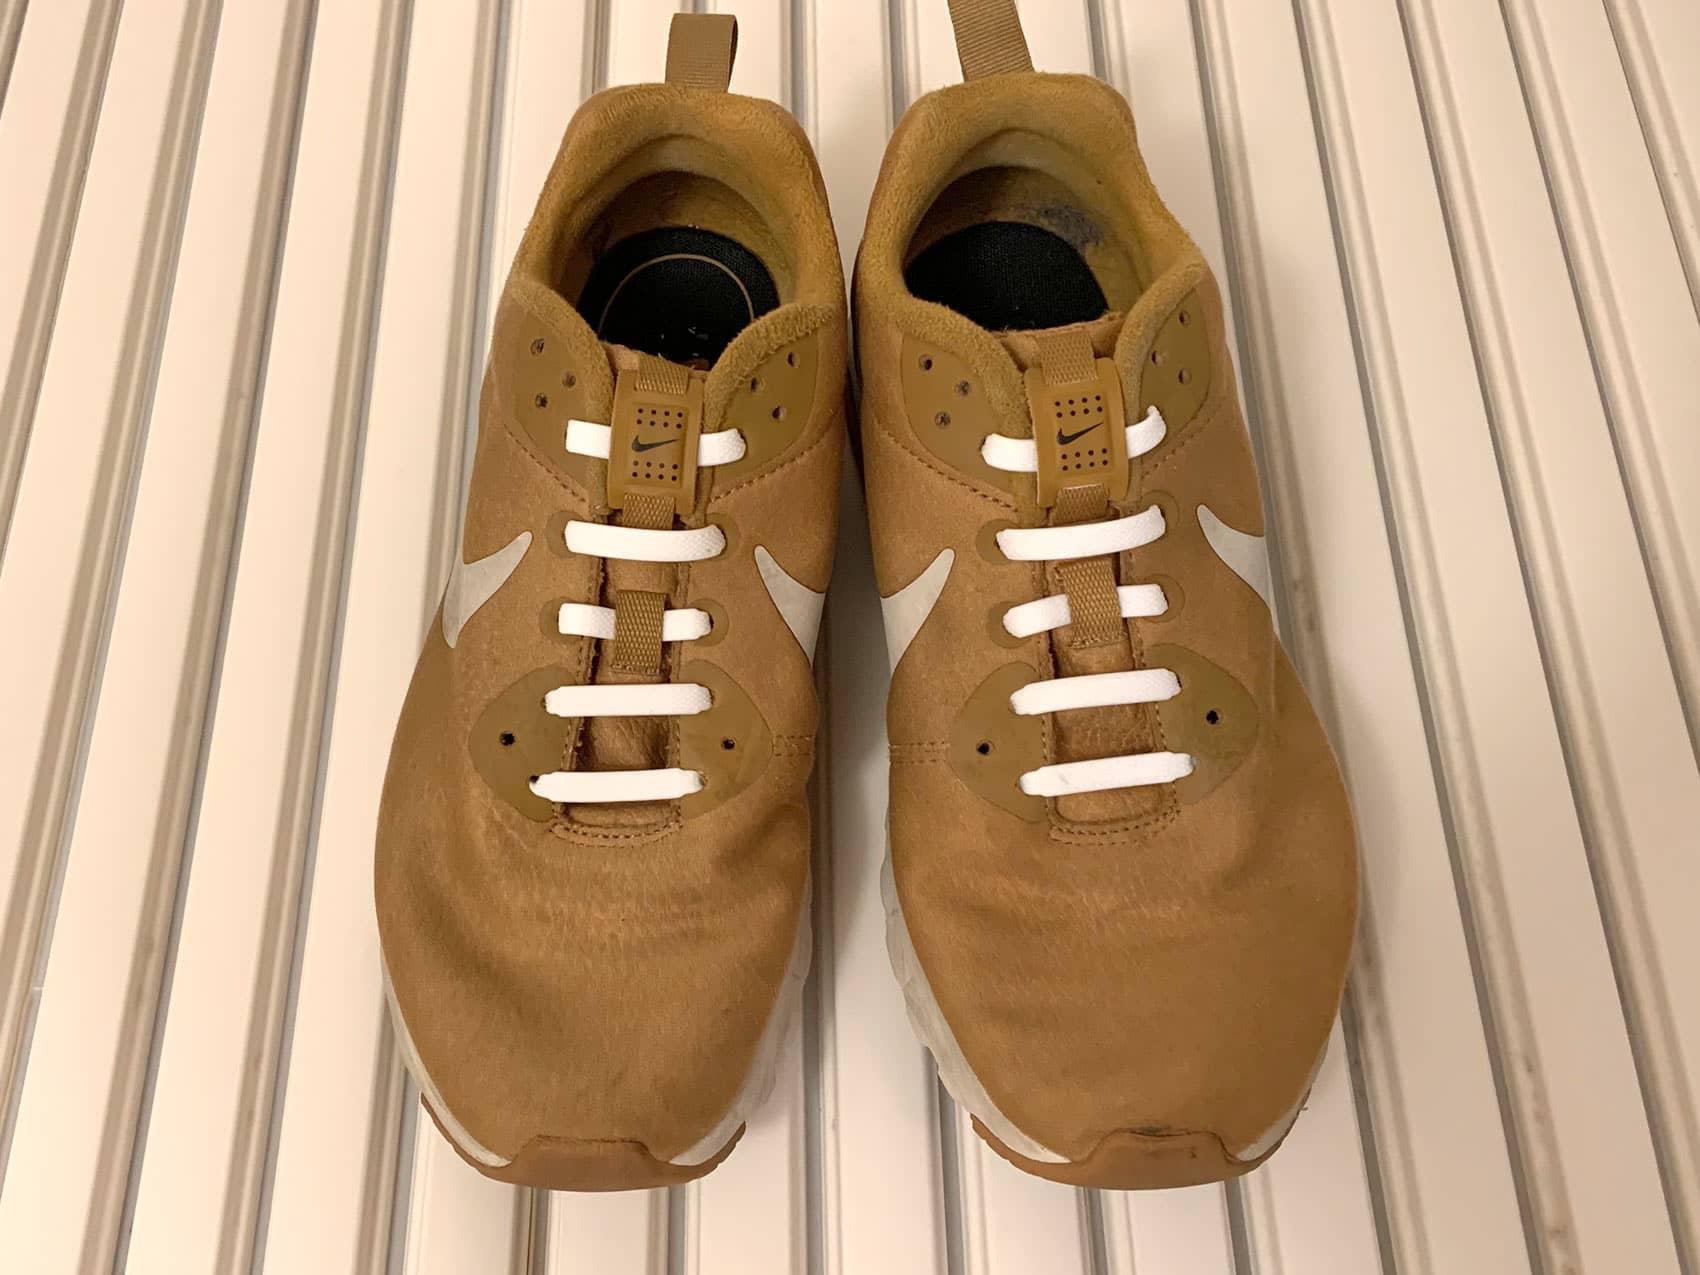 DAISO「結ばない靴紐」取り付けた所